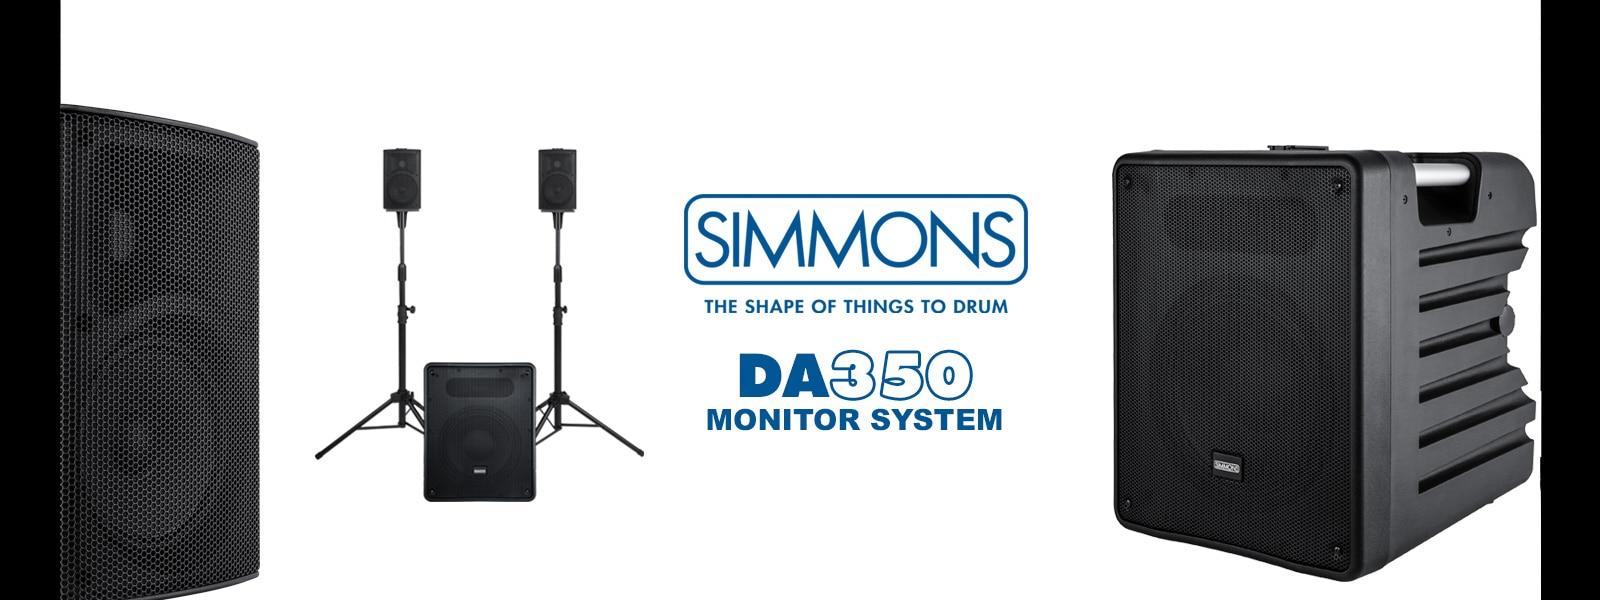 Simmpons DA350 drum monitoring system